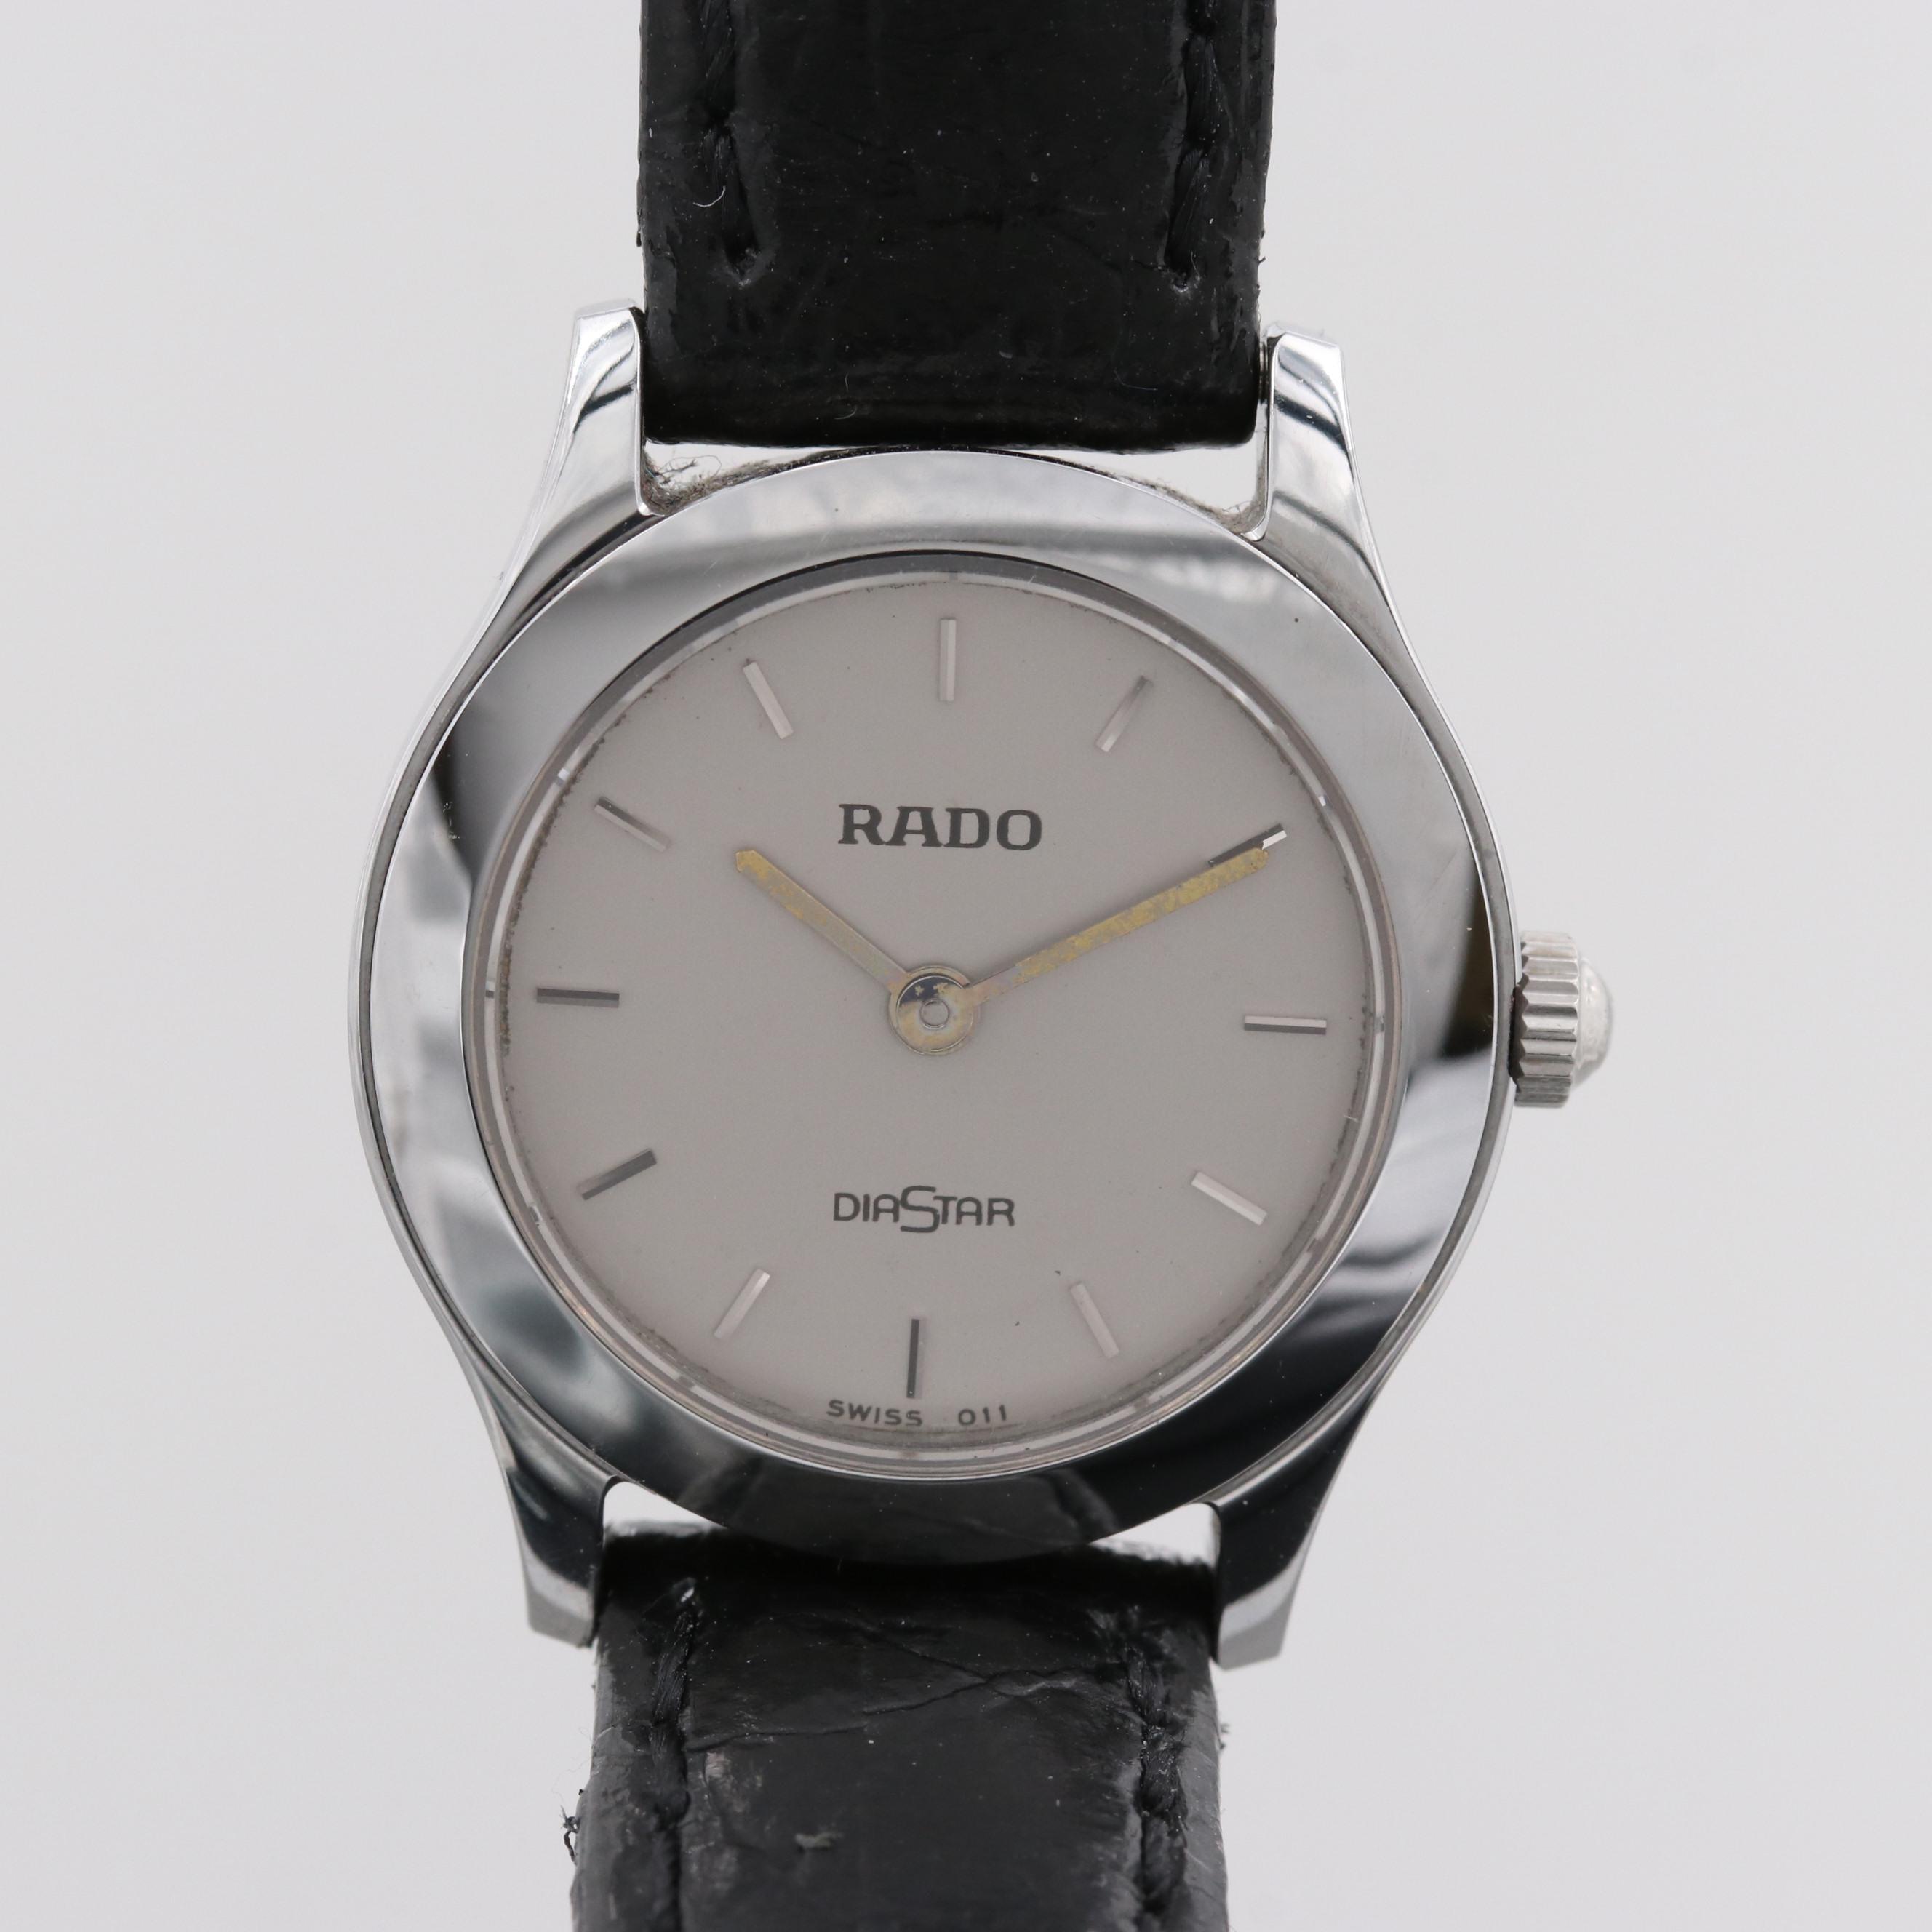 Rado Diastar Stainless Steel Wristwatch